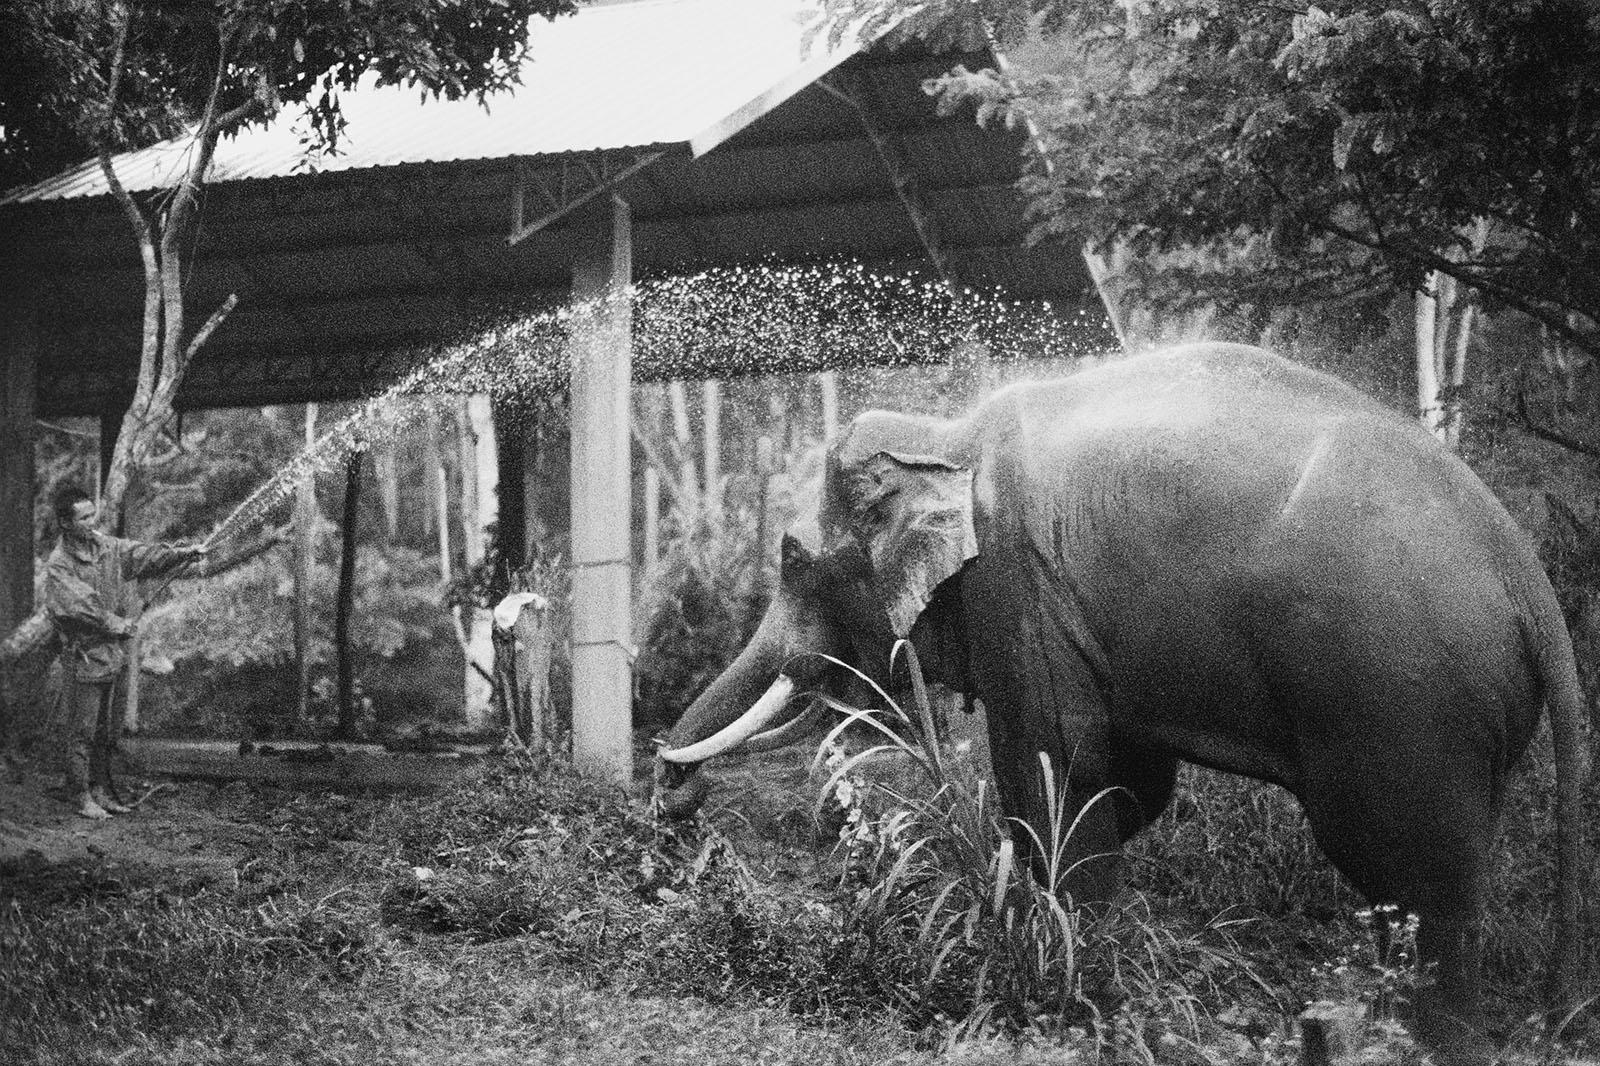 Elephants getting a morning bath at Chai Lai Orchid | Thailand Travel Photos